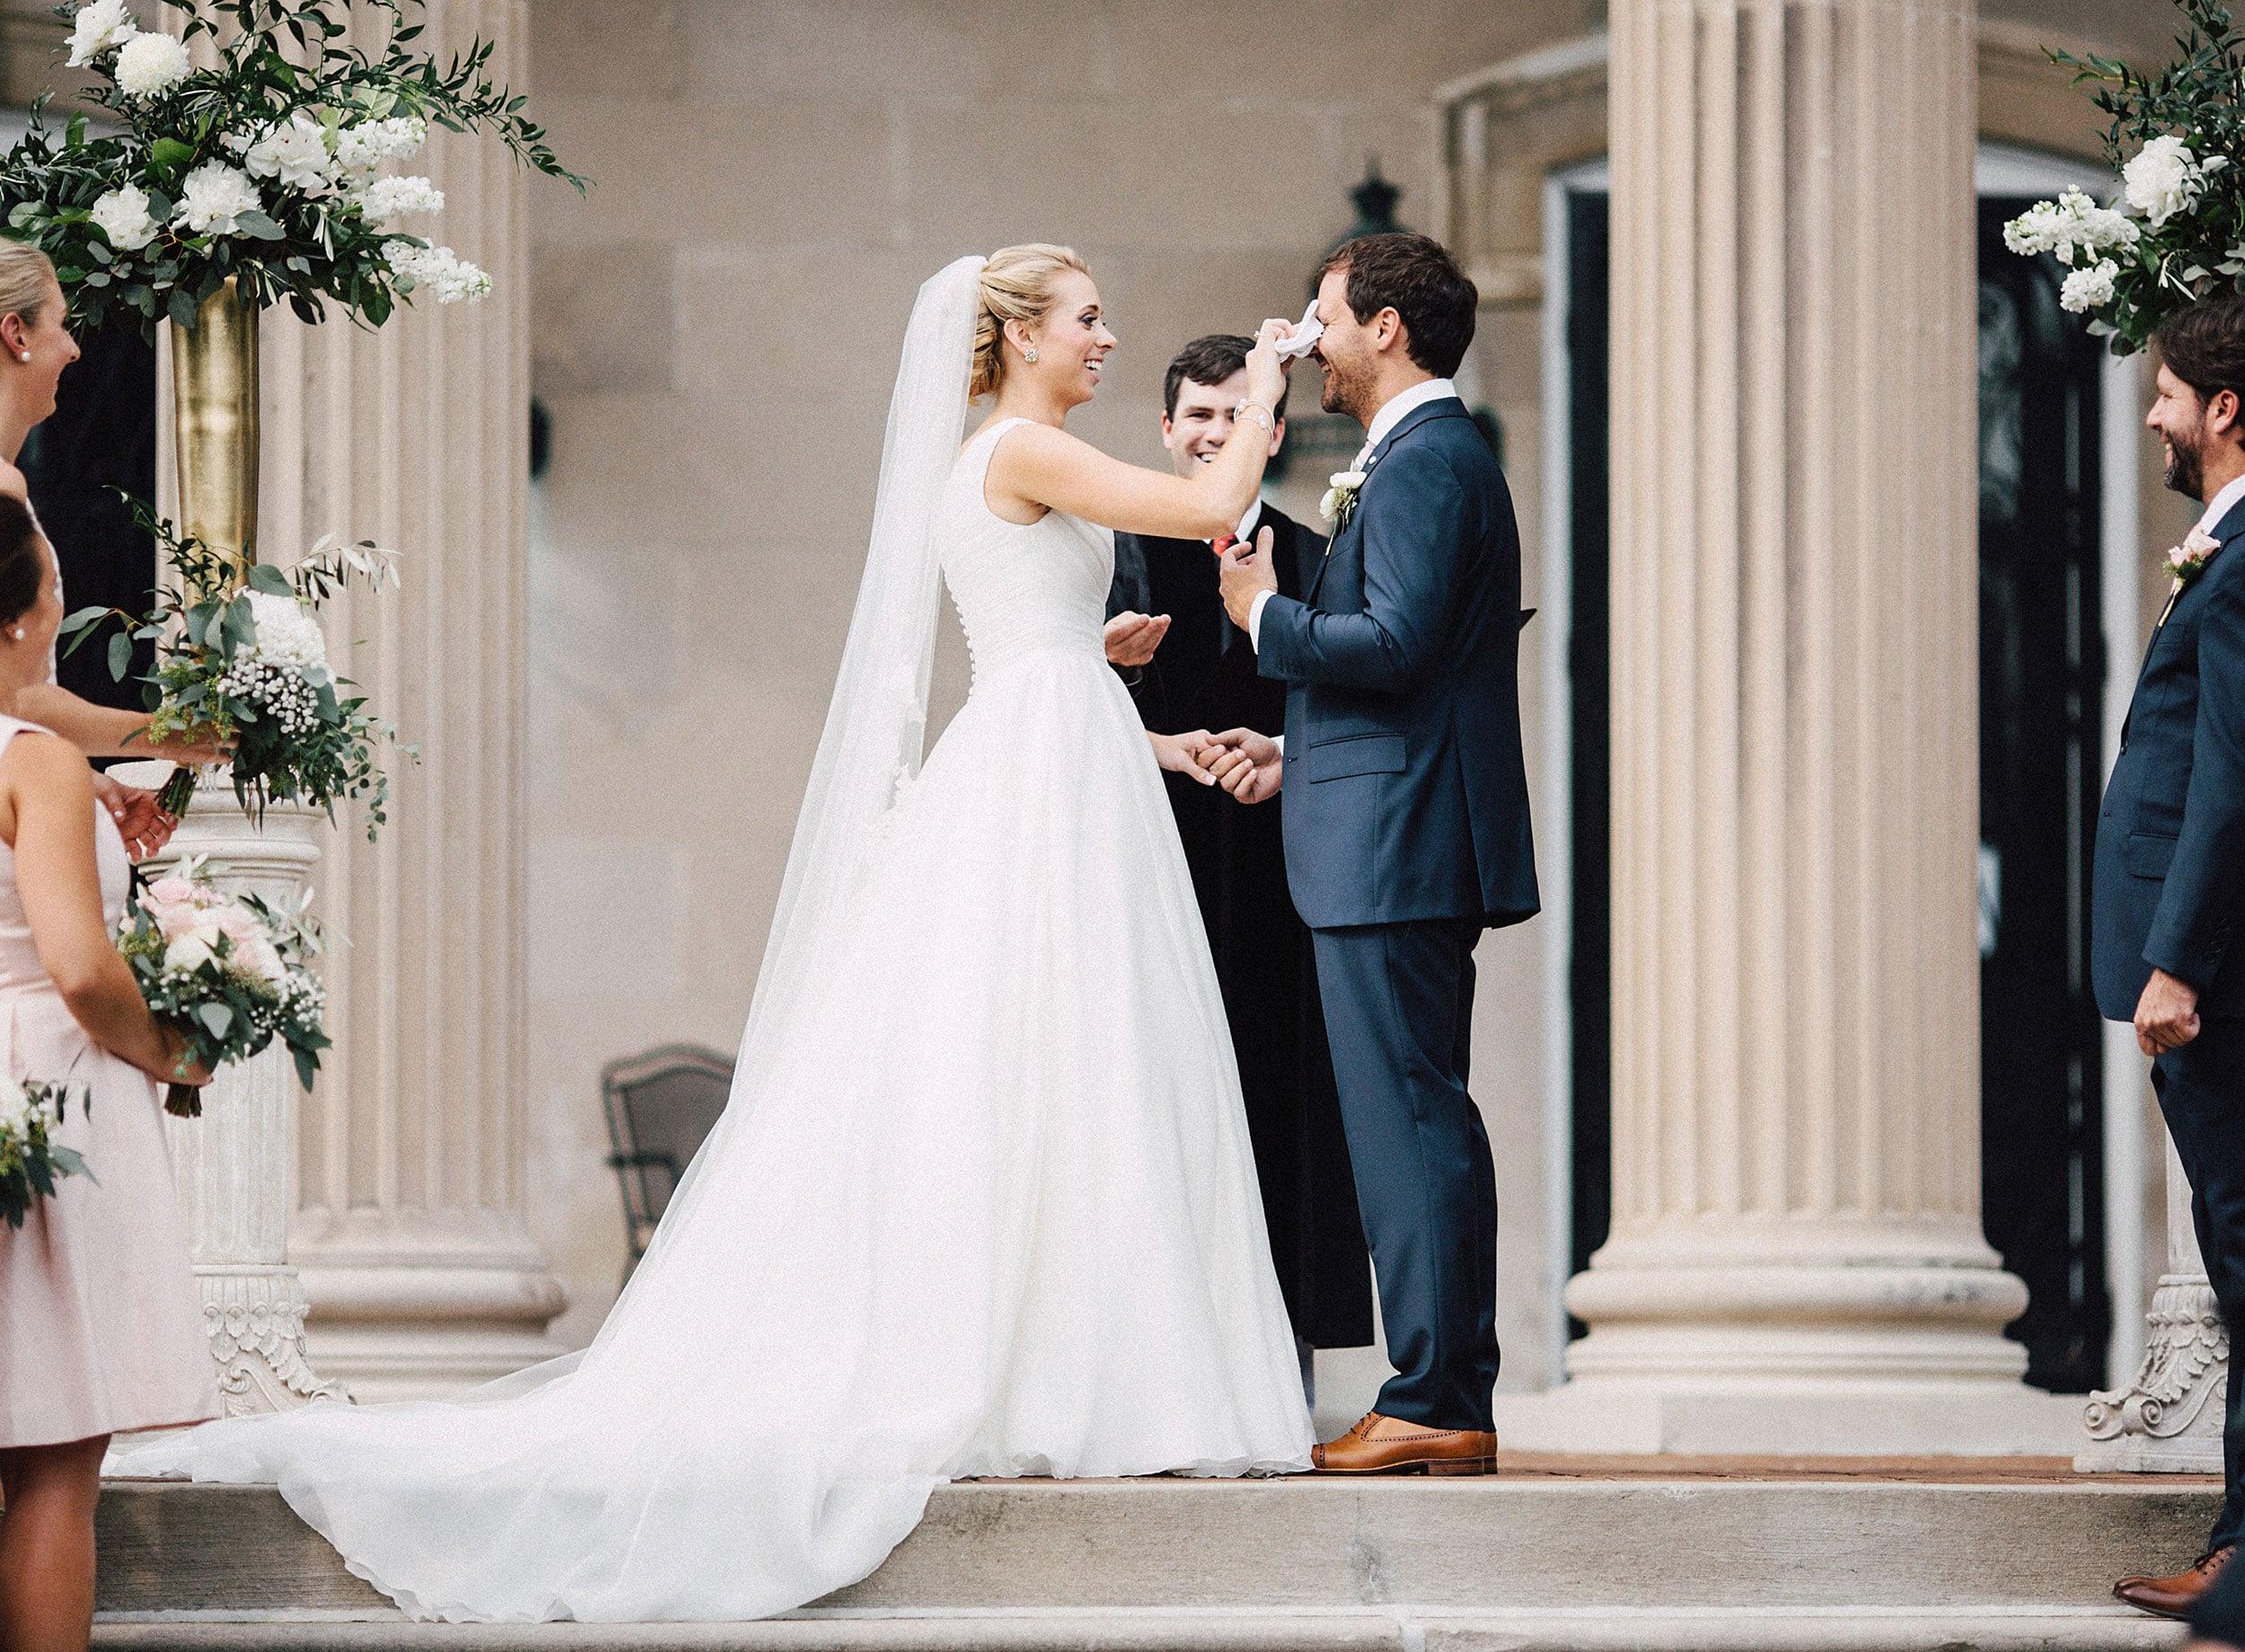 spindletop-lexington-wedding-photographer-025.JPG